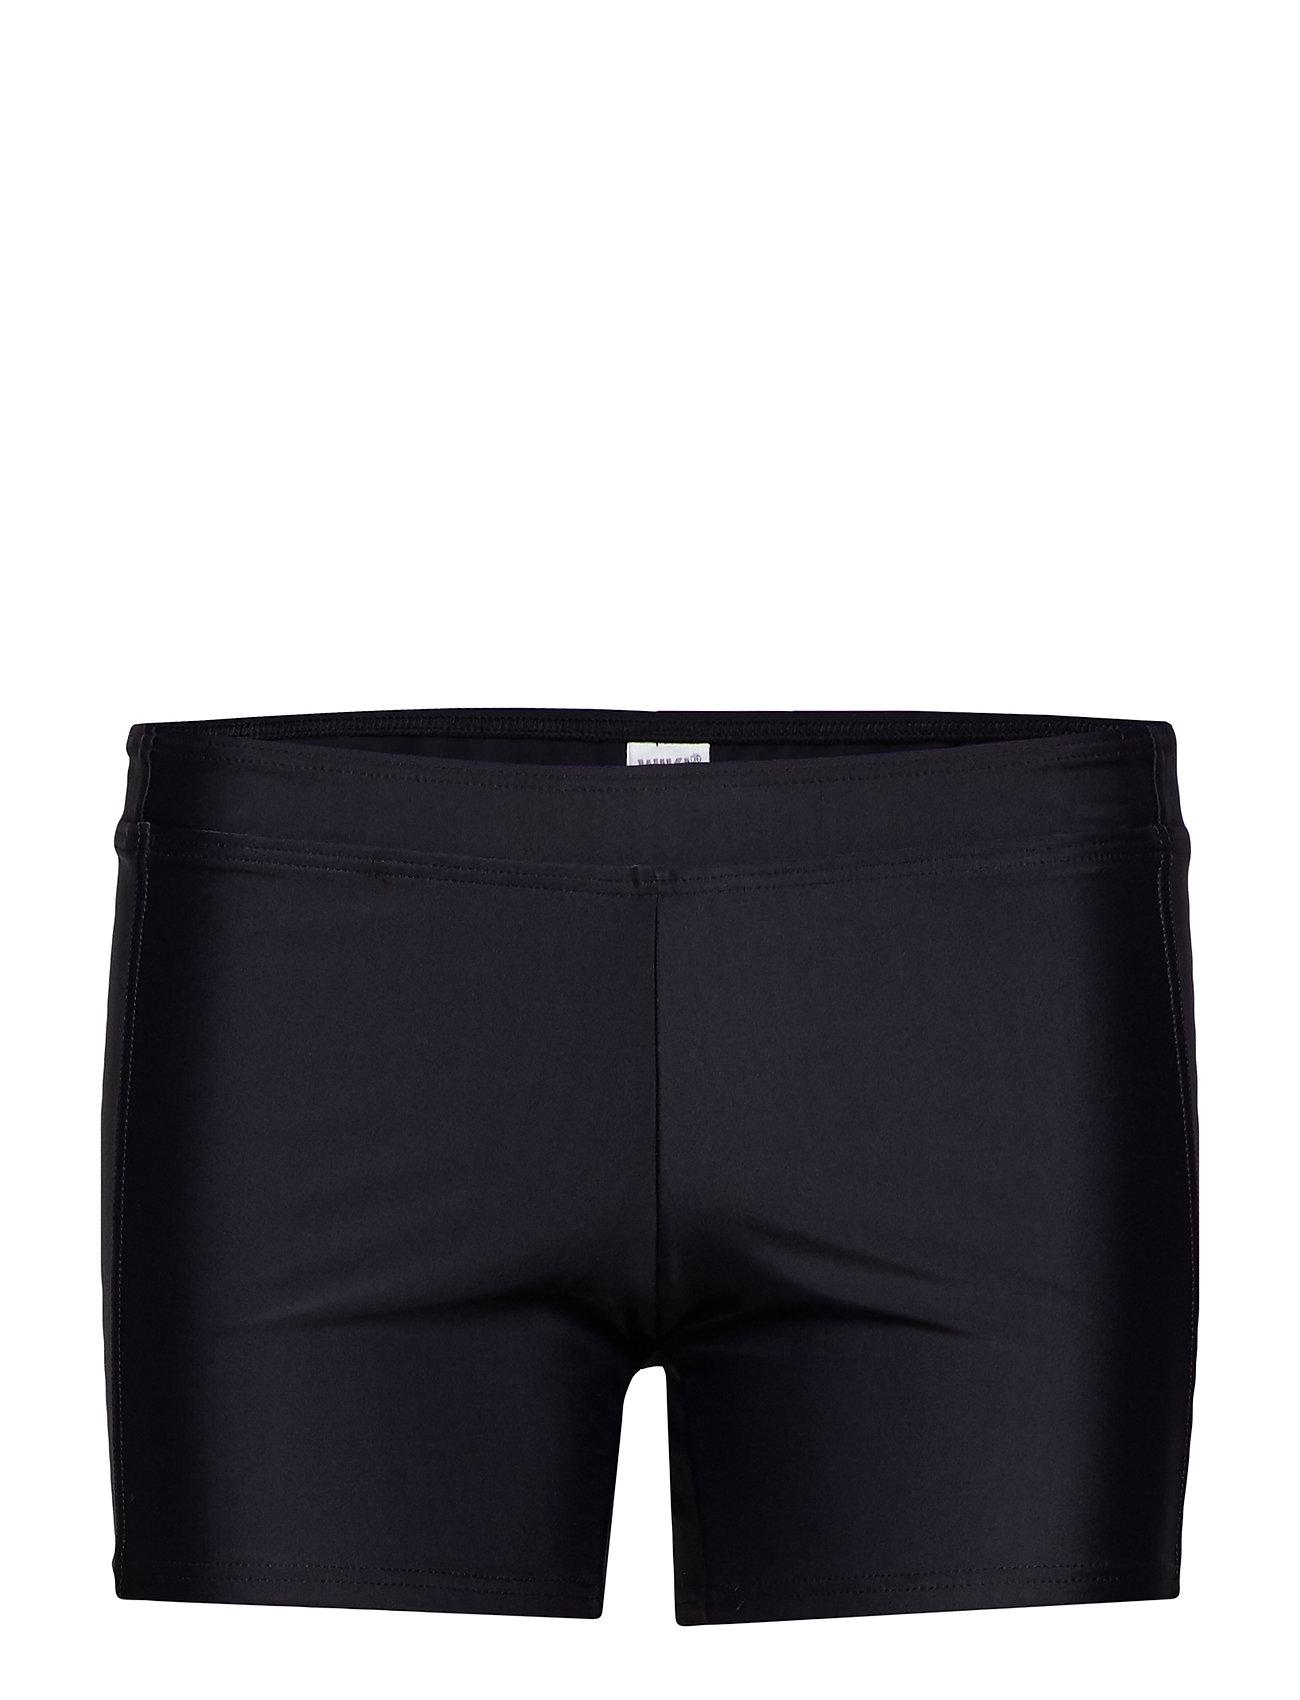 Wiki Swim Panty with leg - BLACK